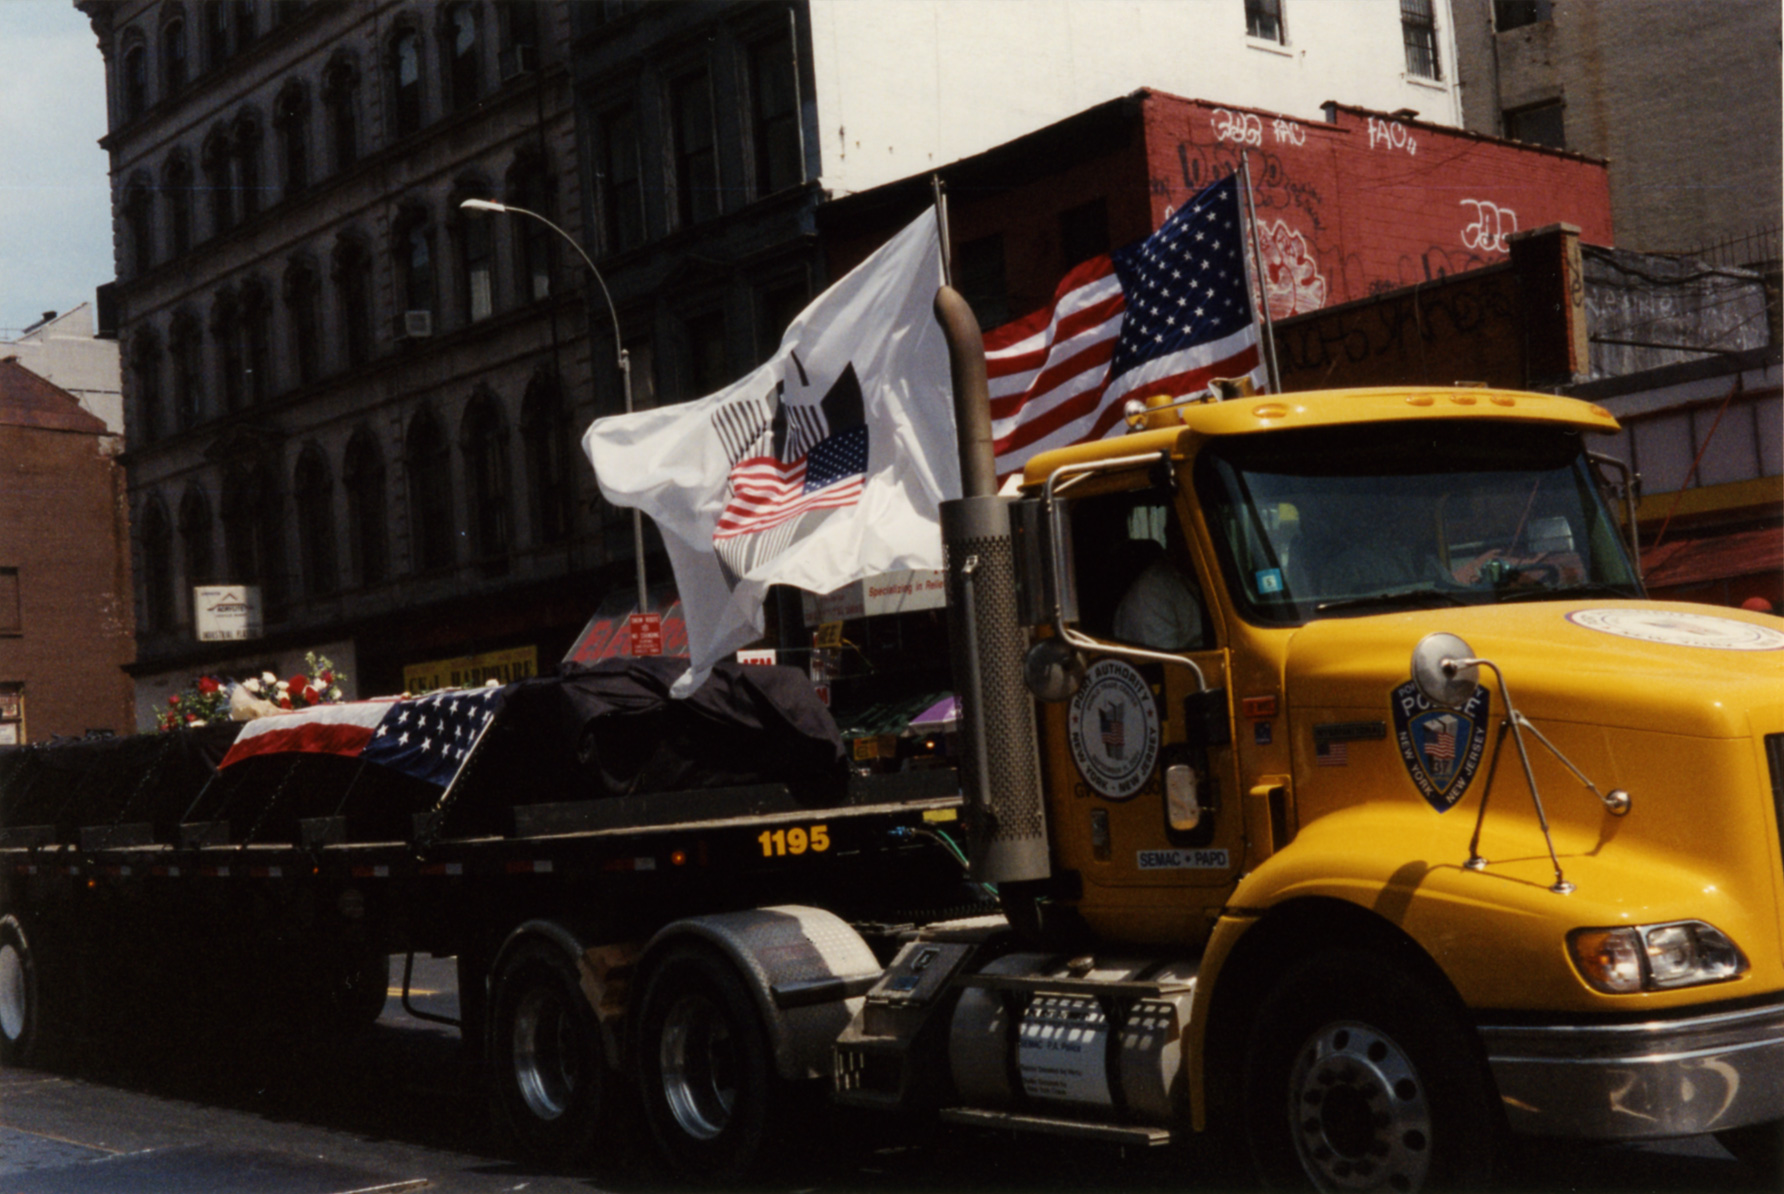 days in new york city a photo essay 2011 09 11 20023removalofthelastwtcbeam jpg